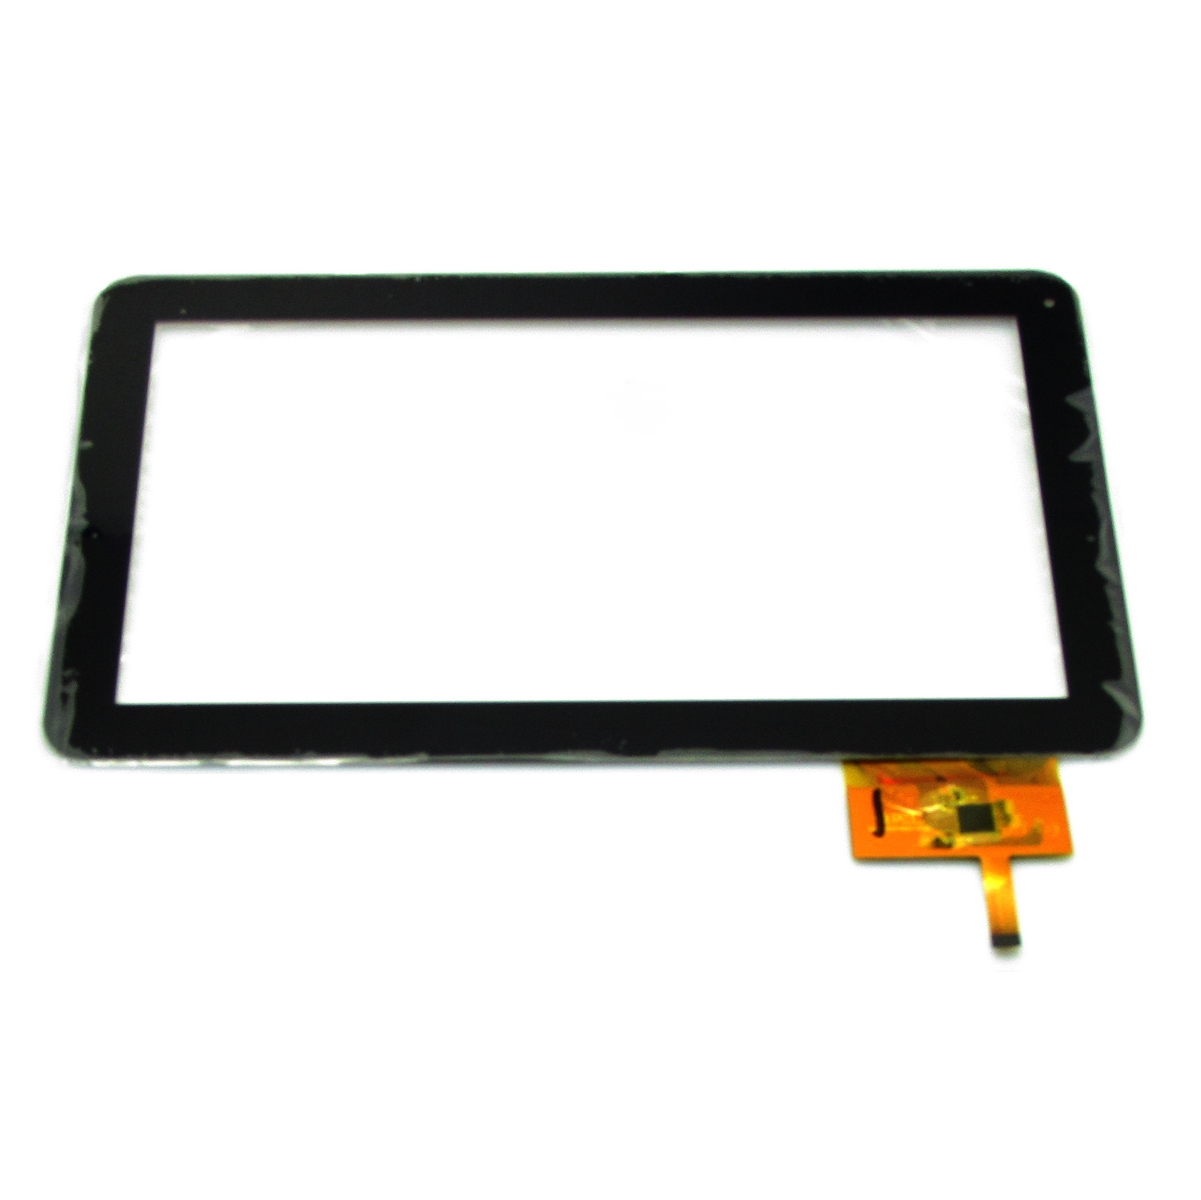 Touchscreen Digitizer Polaroid MIDC410PR003 12 pini Geam Sticla Tableta imagine powerlaptop.ro 2021